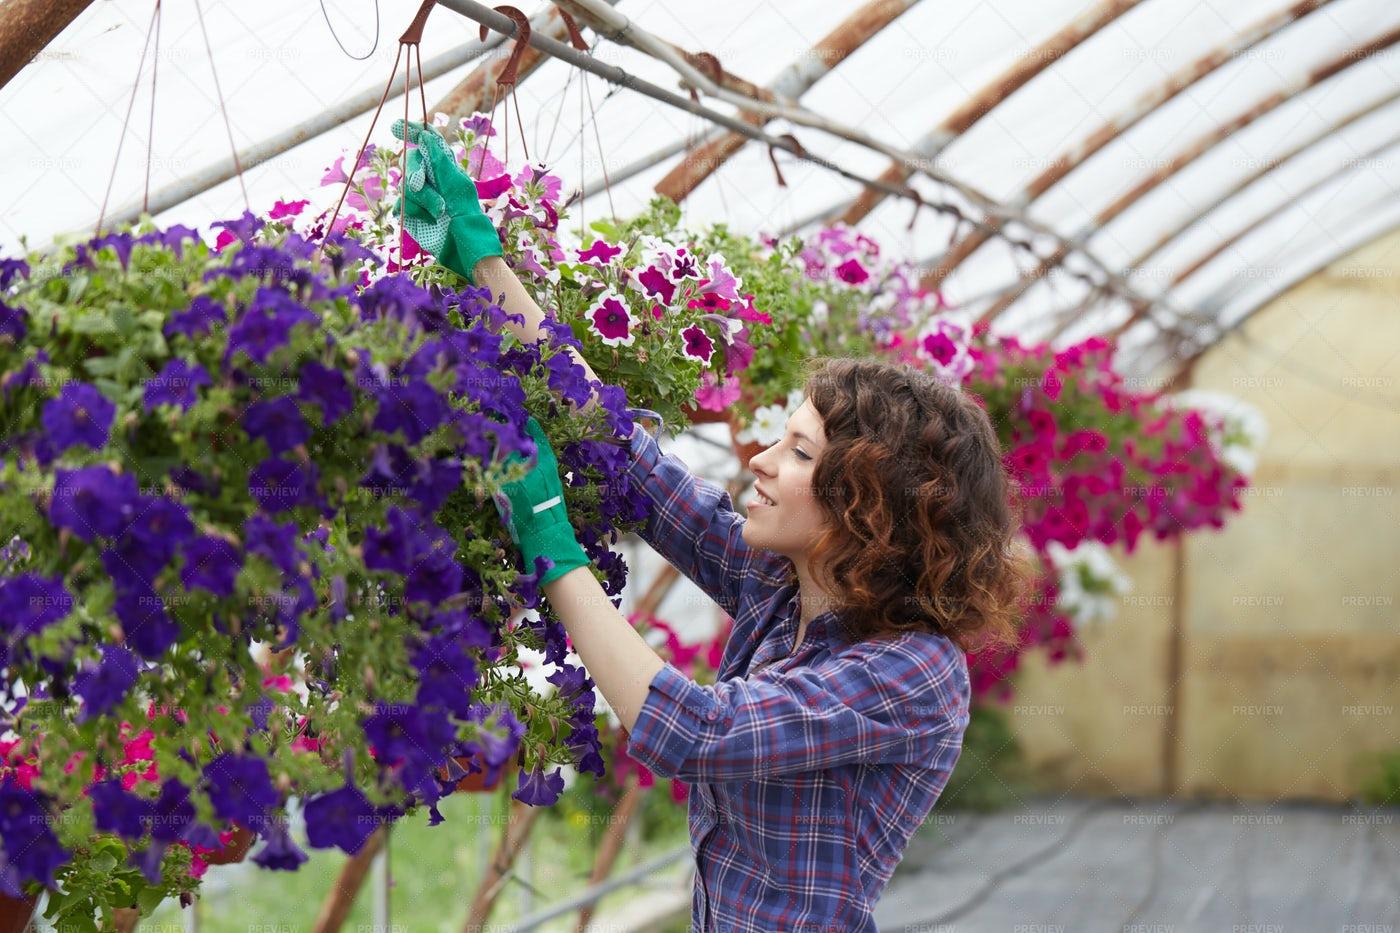 Florist Taking Care Of Her Garden: Stock Photos